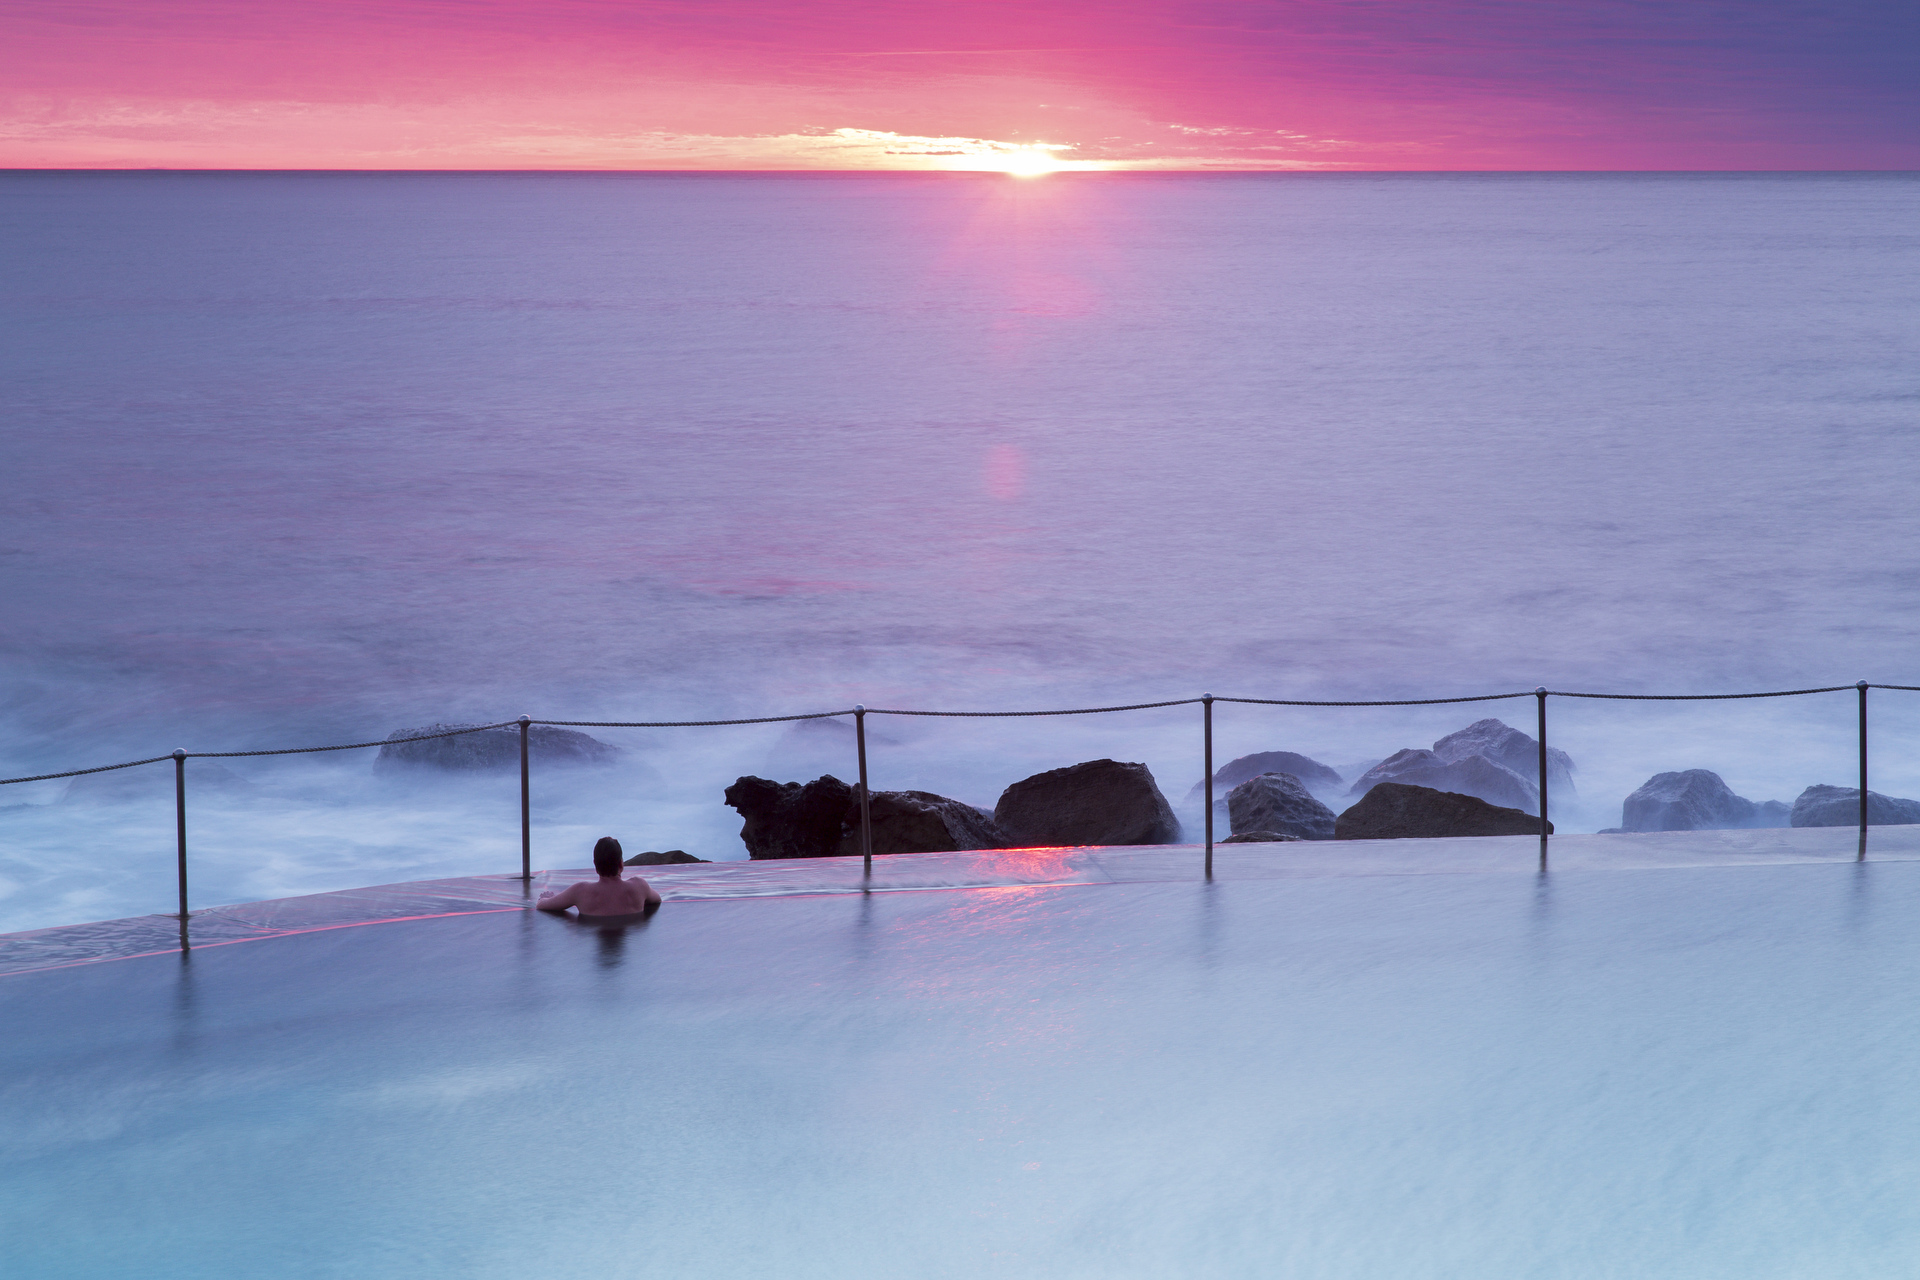 Sydney landscape photographer, sunrise, sunset, ocean, ocean pool, landscape, award winning, travel, NSW, Australia, sea, fine art prints, While you were sleeping, Bronte